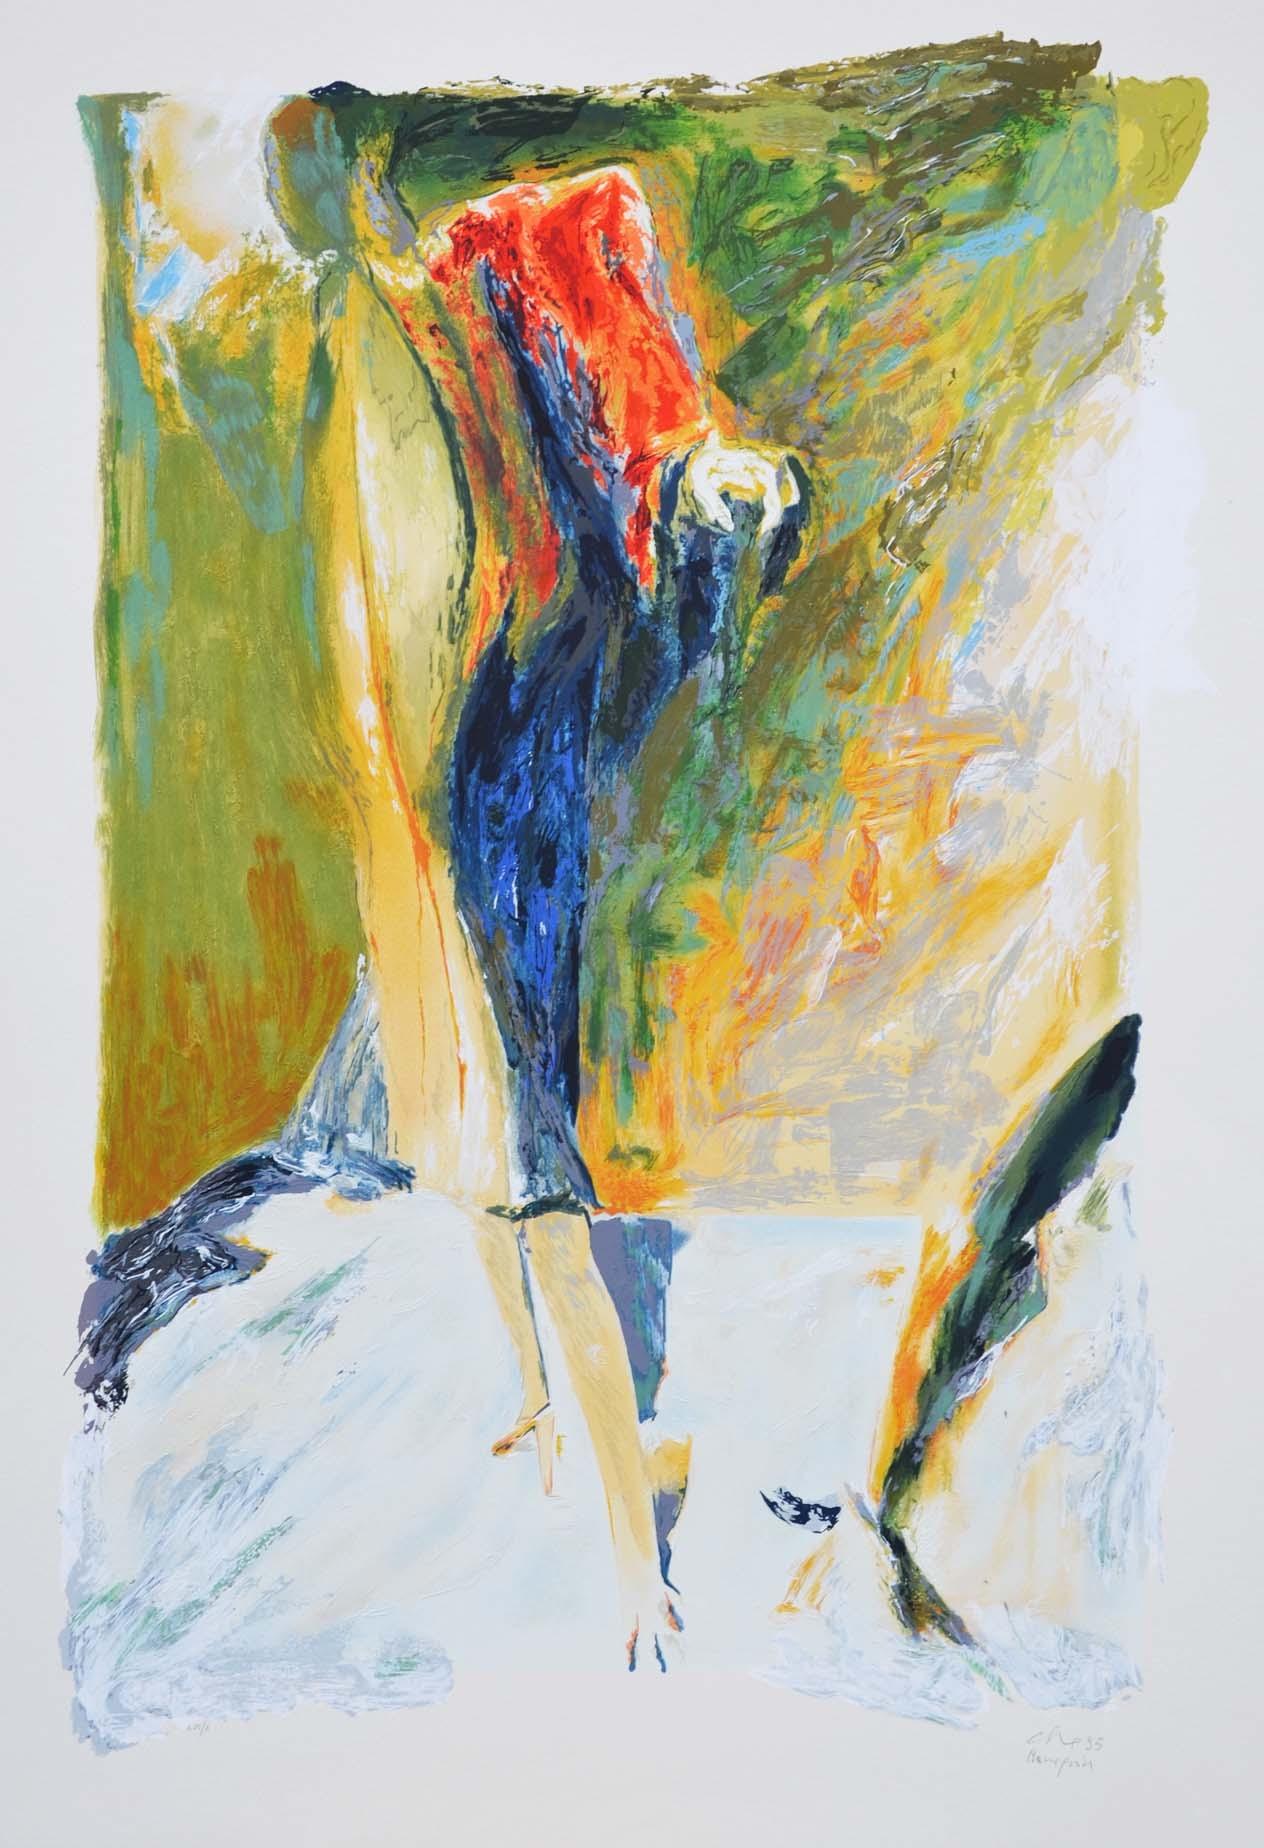 Calabria Ennio, Mannequin, Serigrafia, Formato cm 100x70